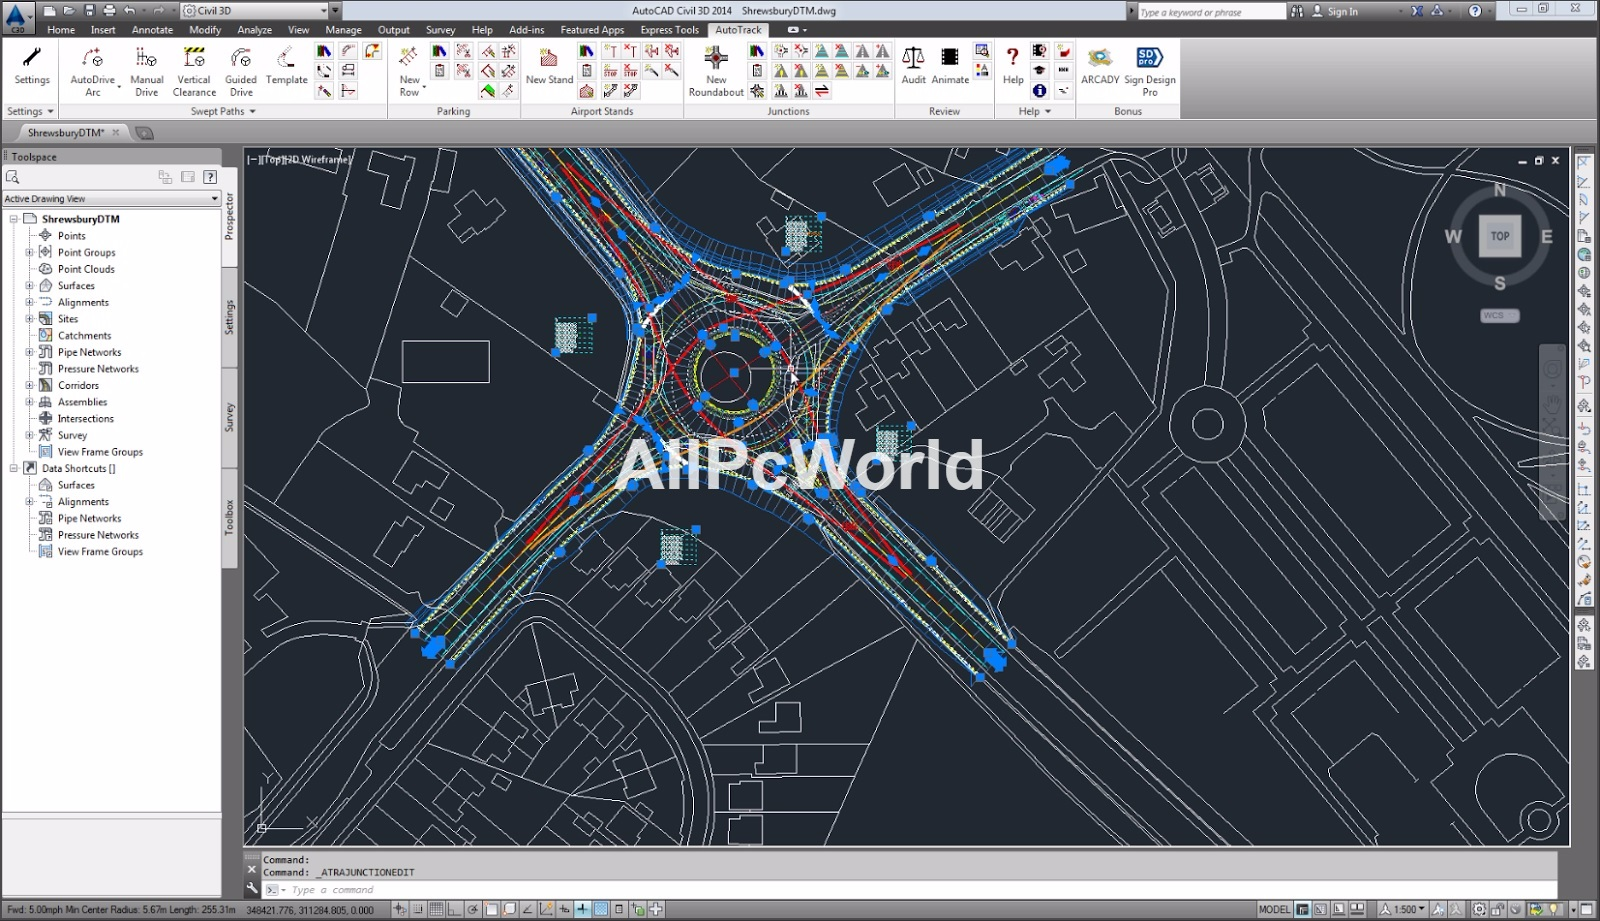 autodesk autocad civil 3d 2017 user interface all pc world. Black Bedroom Furniture Sets. Home Design Ideas